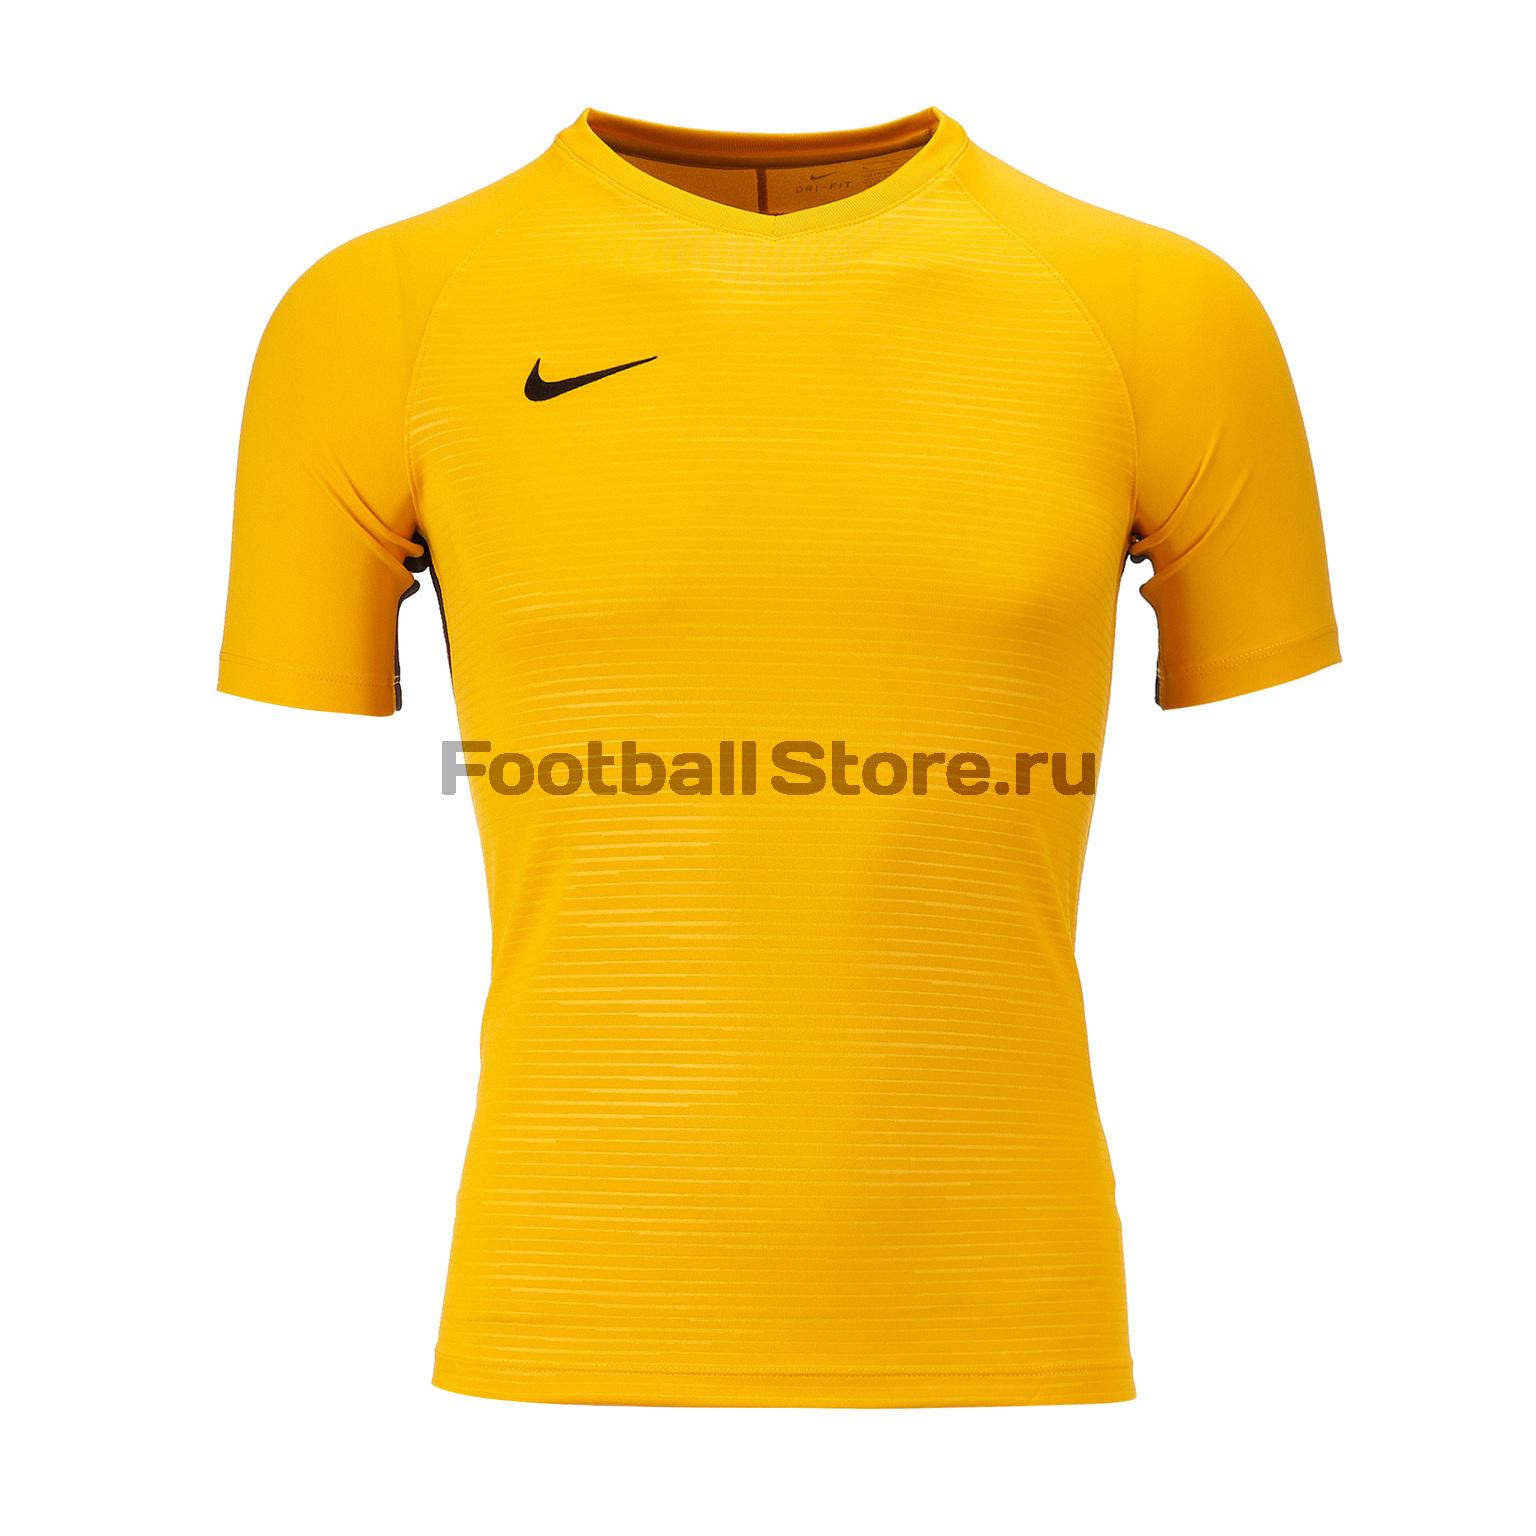 Футболка детская Nike Dry Tiempo Premier 894111-739 tiempo muerto